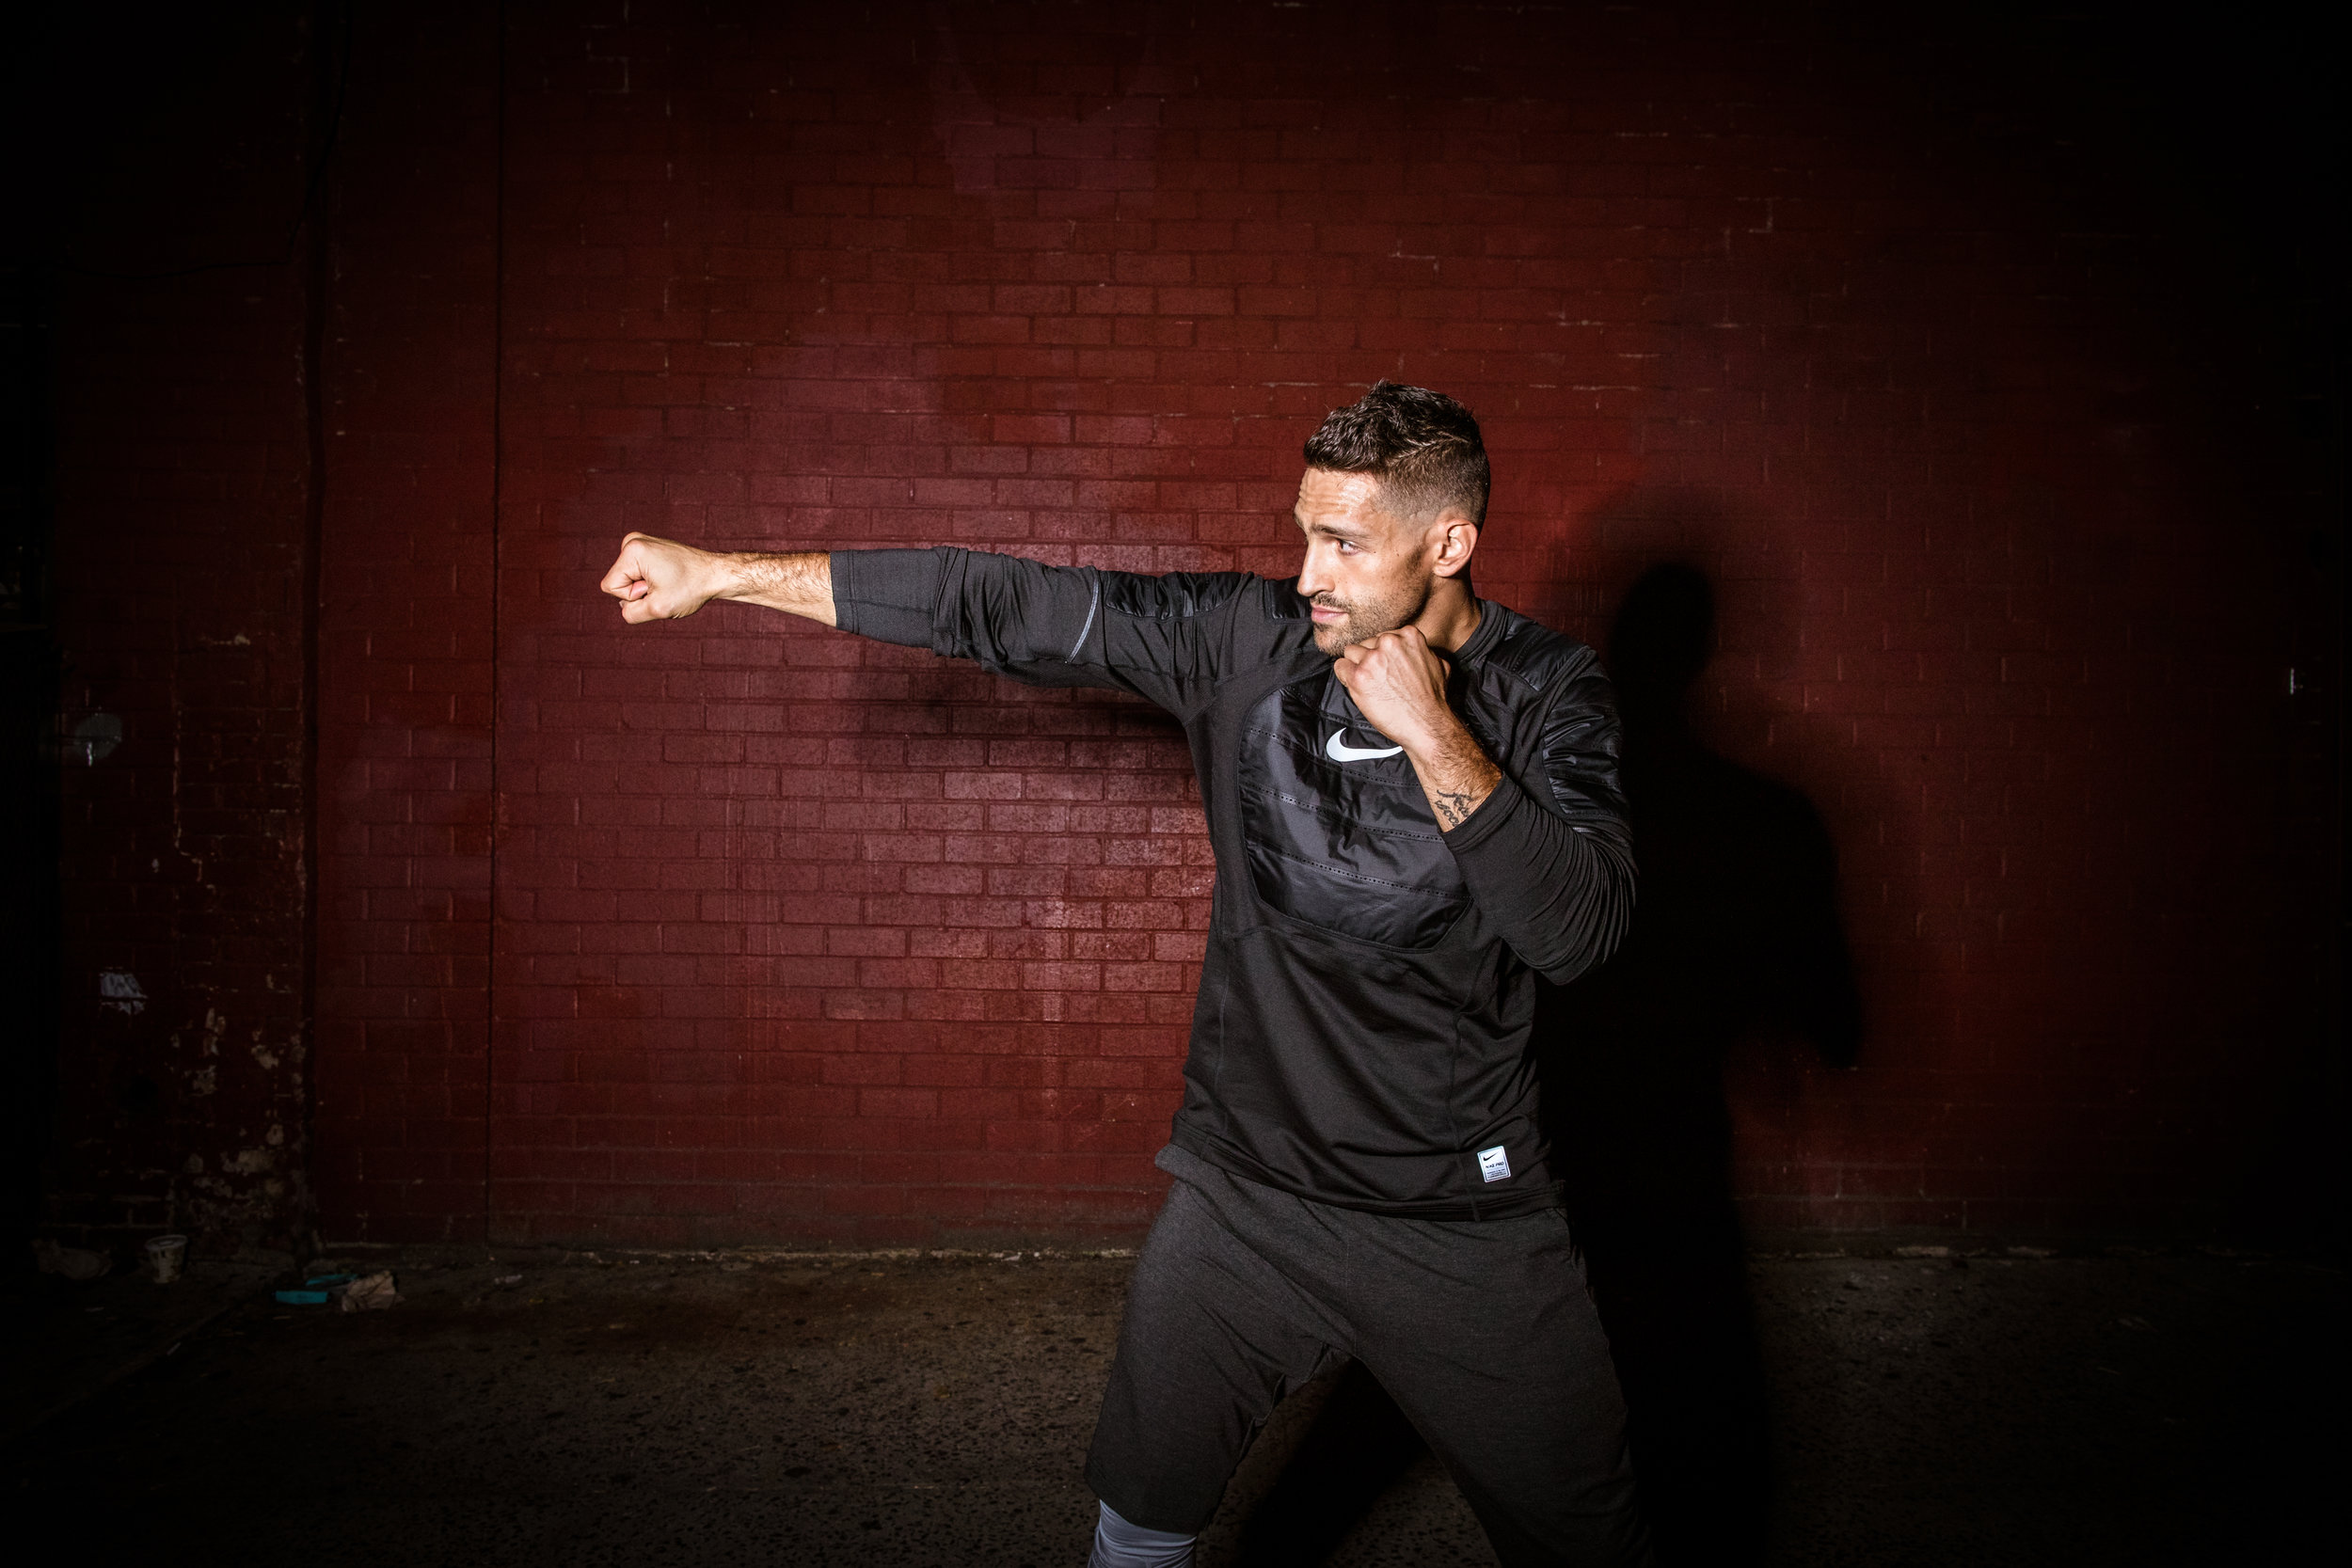 Noah Neiman nike photographer training fitness boxing NYC LA loa angeles Chicago